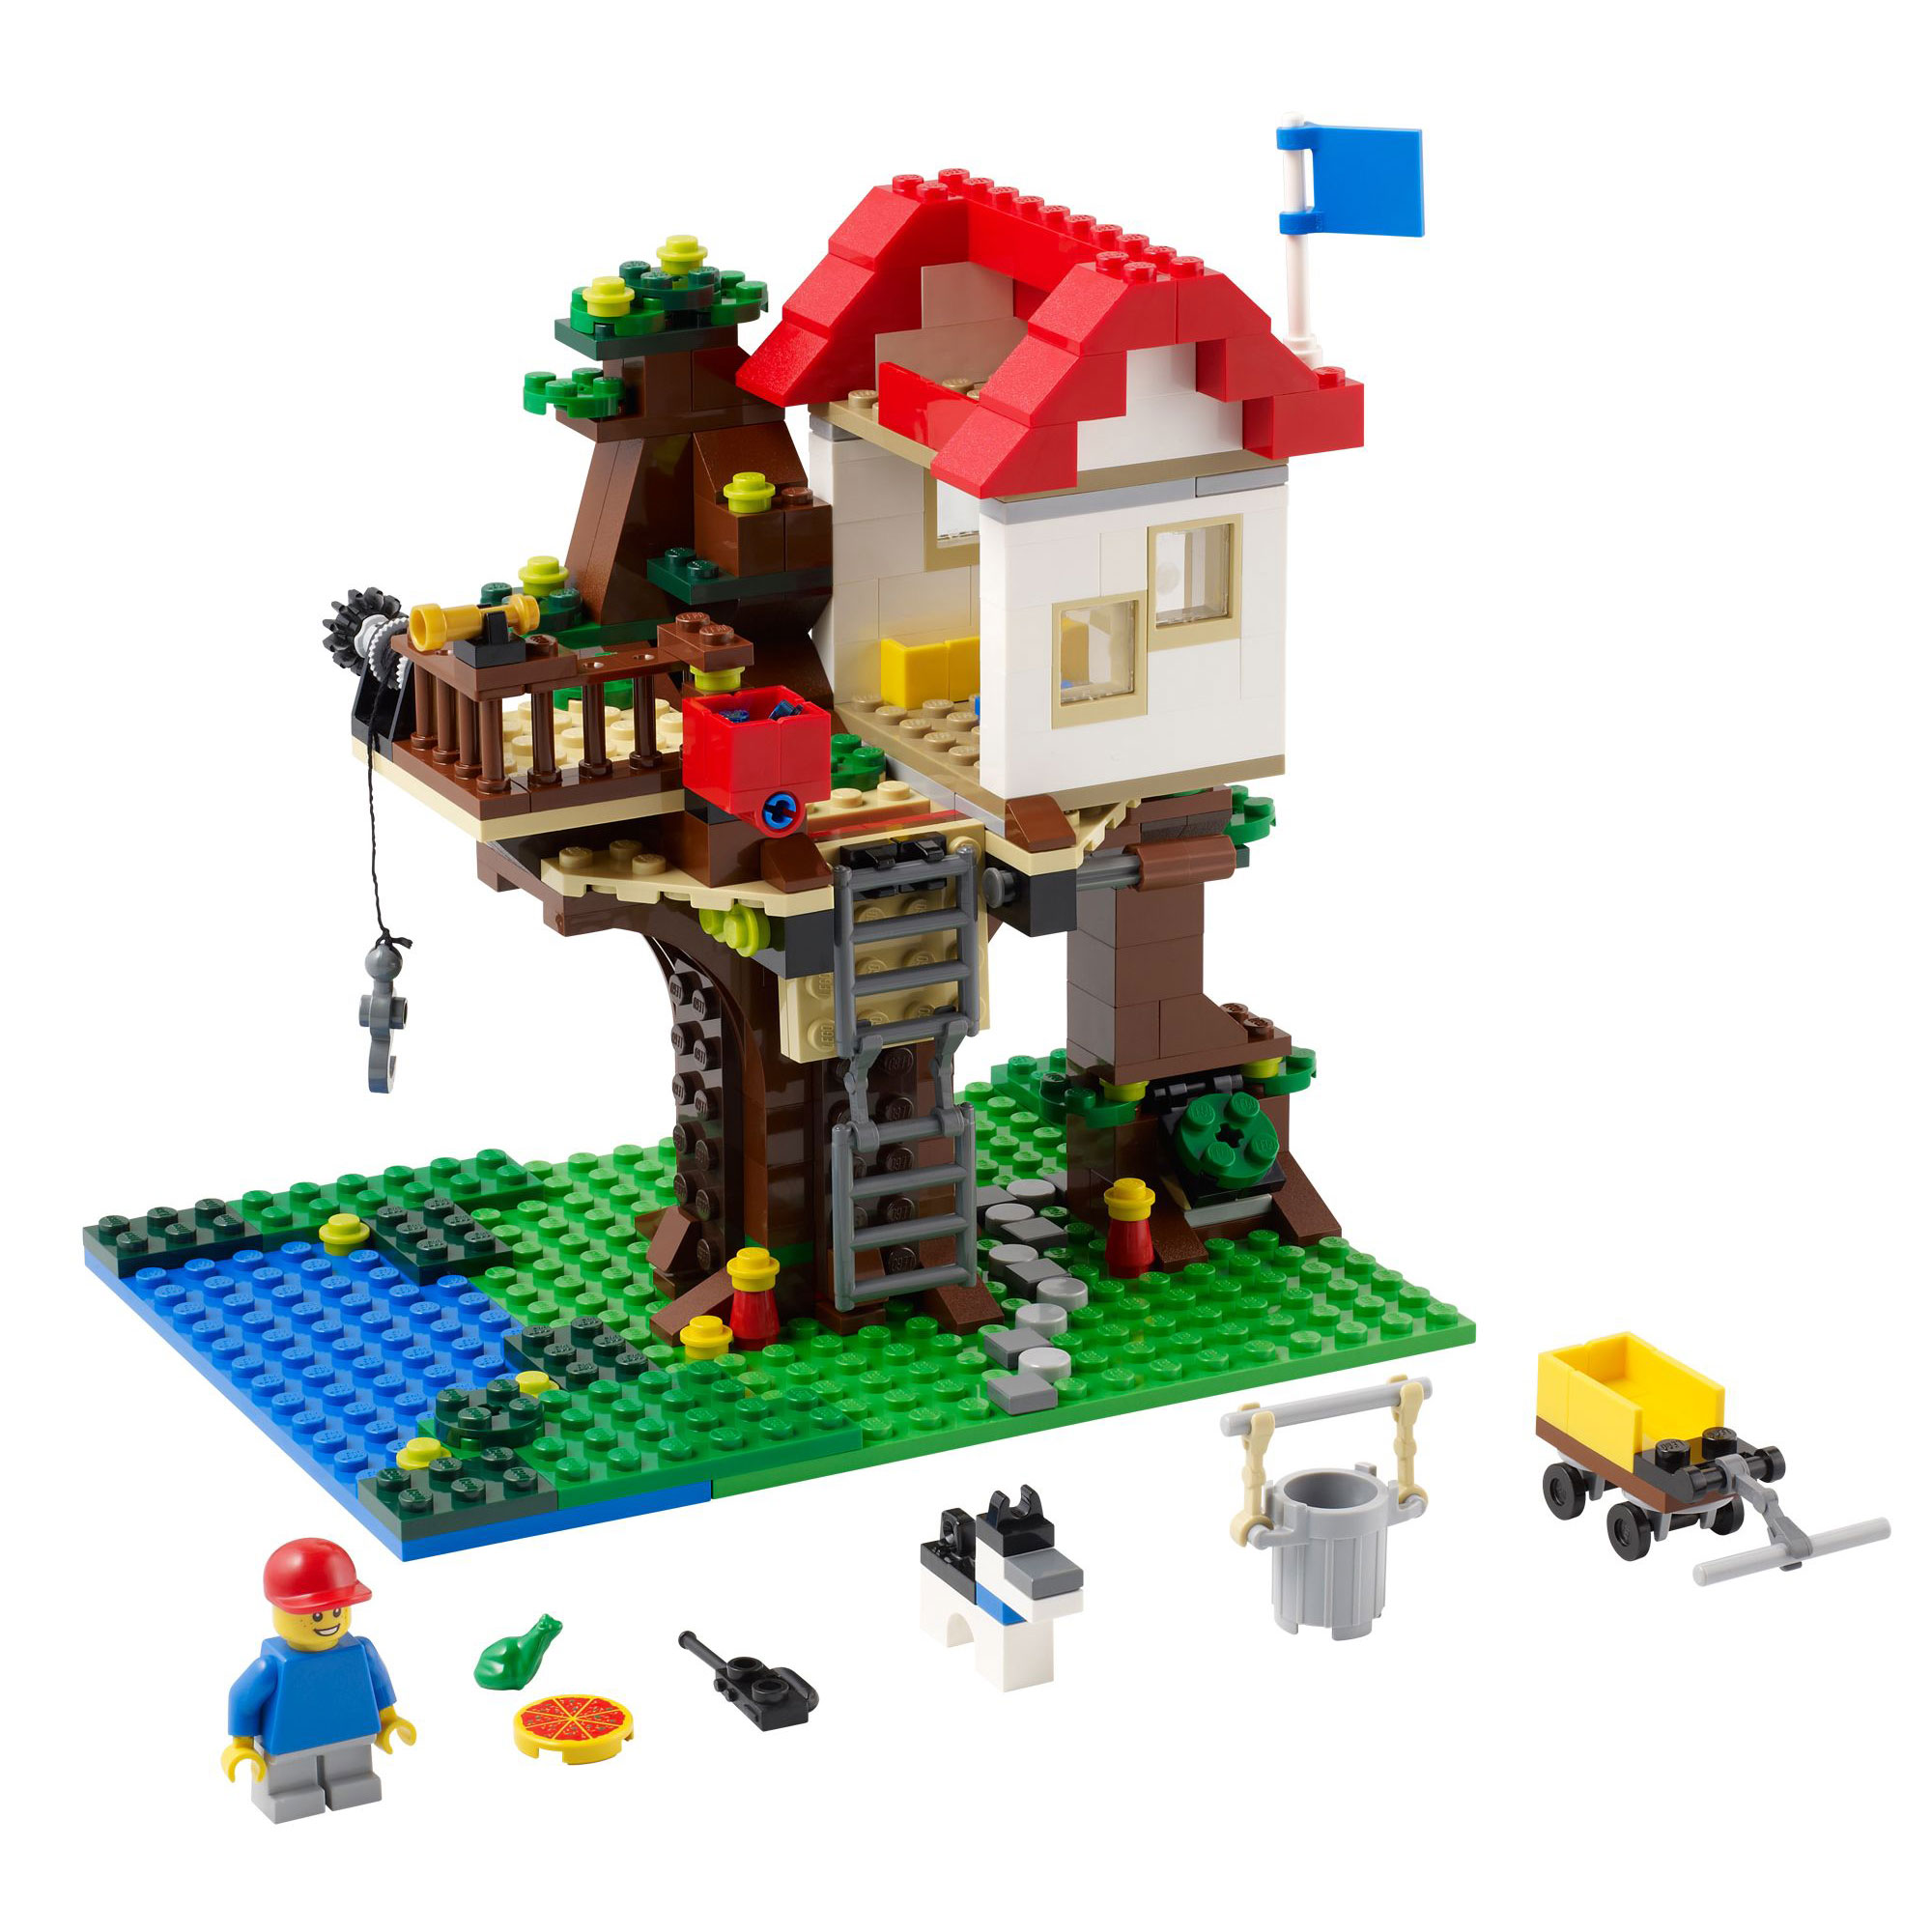 Lego 31010 Lego Creator Tree House